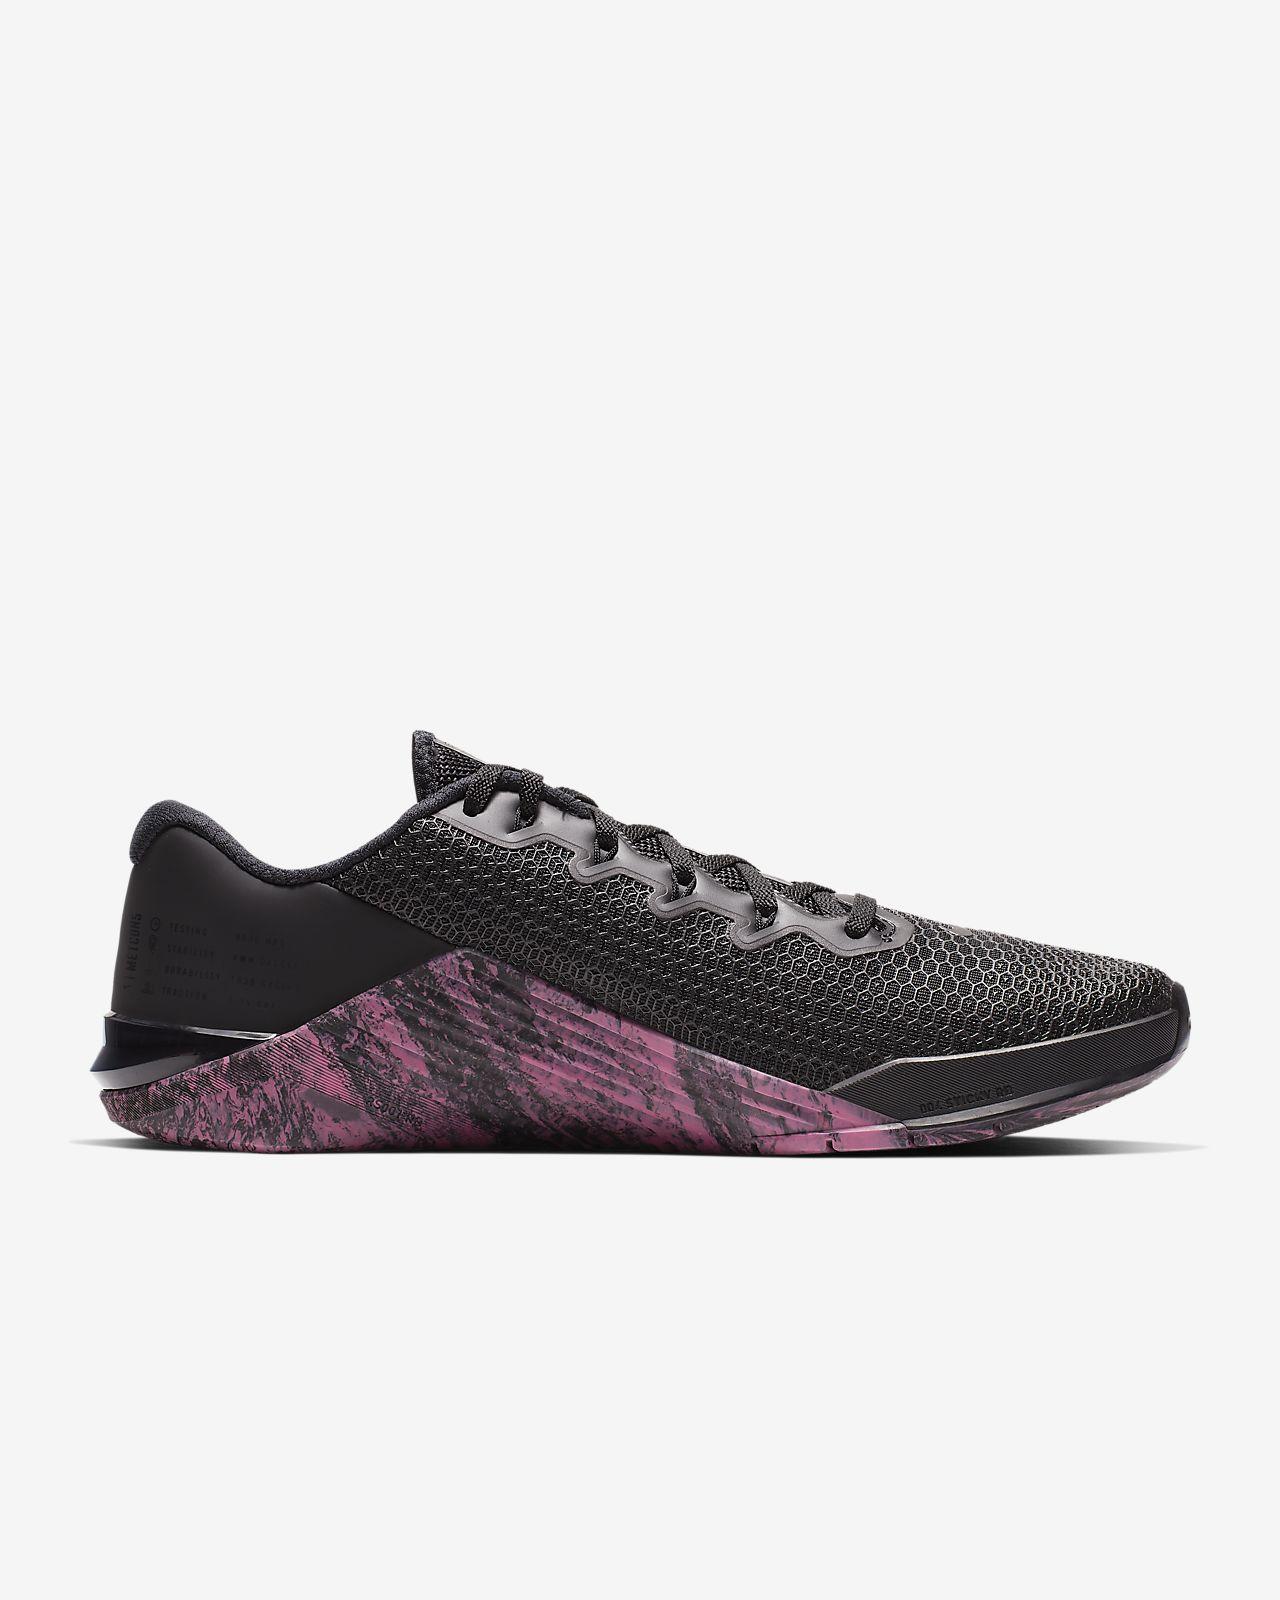 0824ccd9824 Nike Metcon 5 Training Shoe